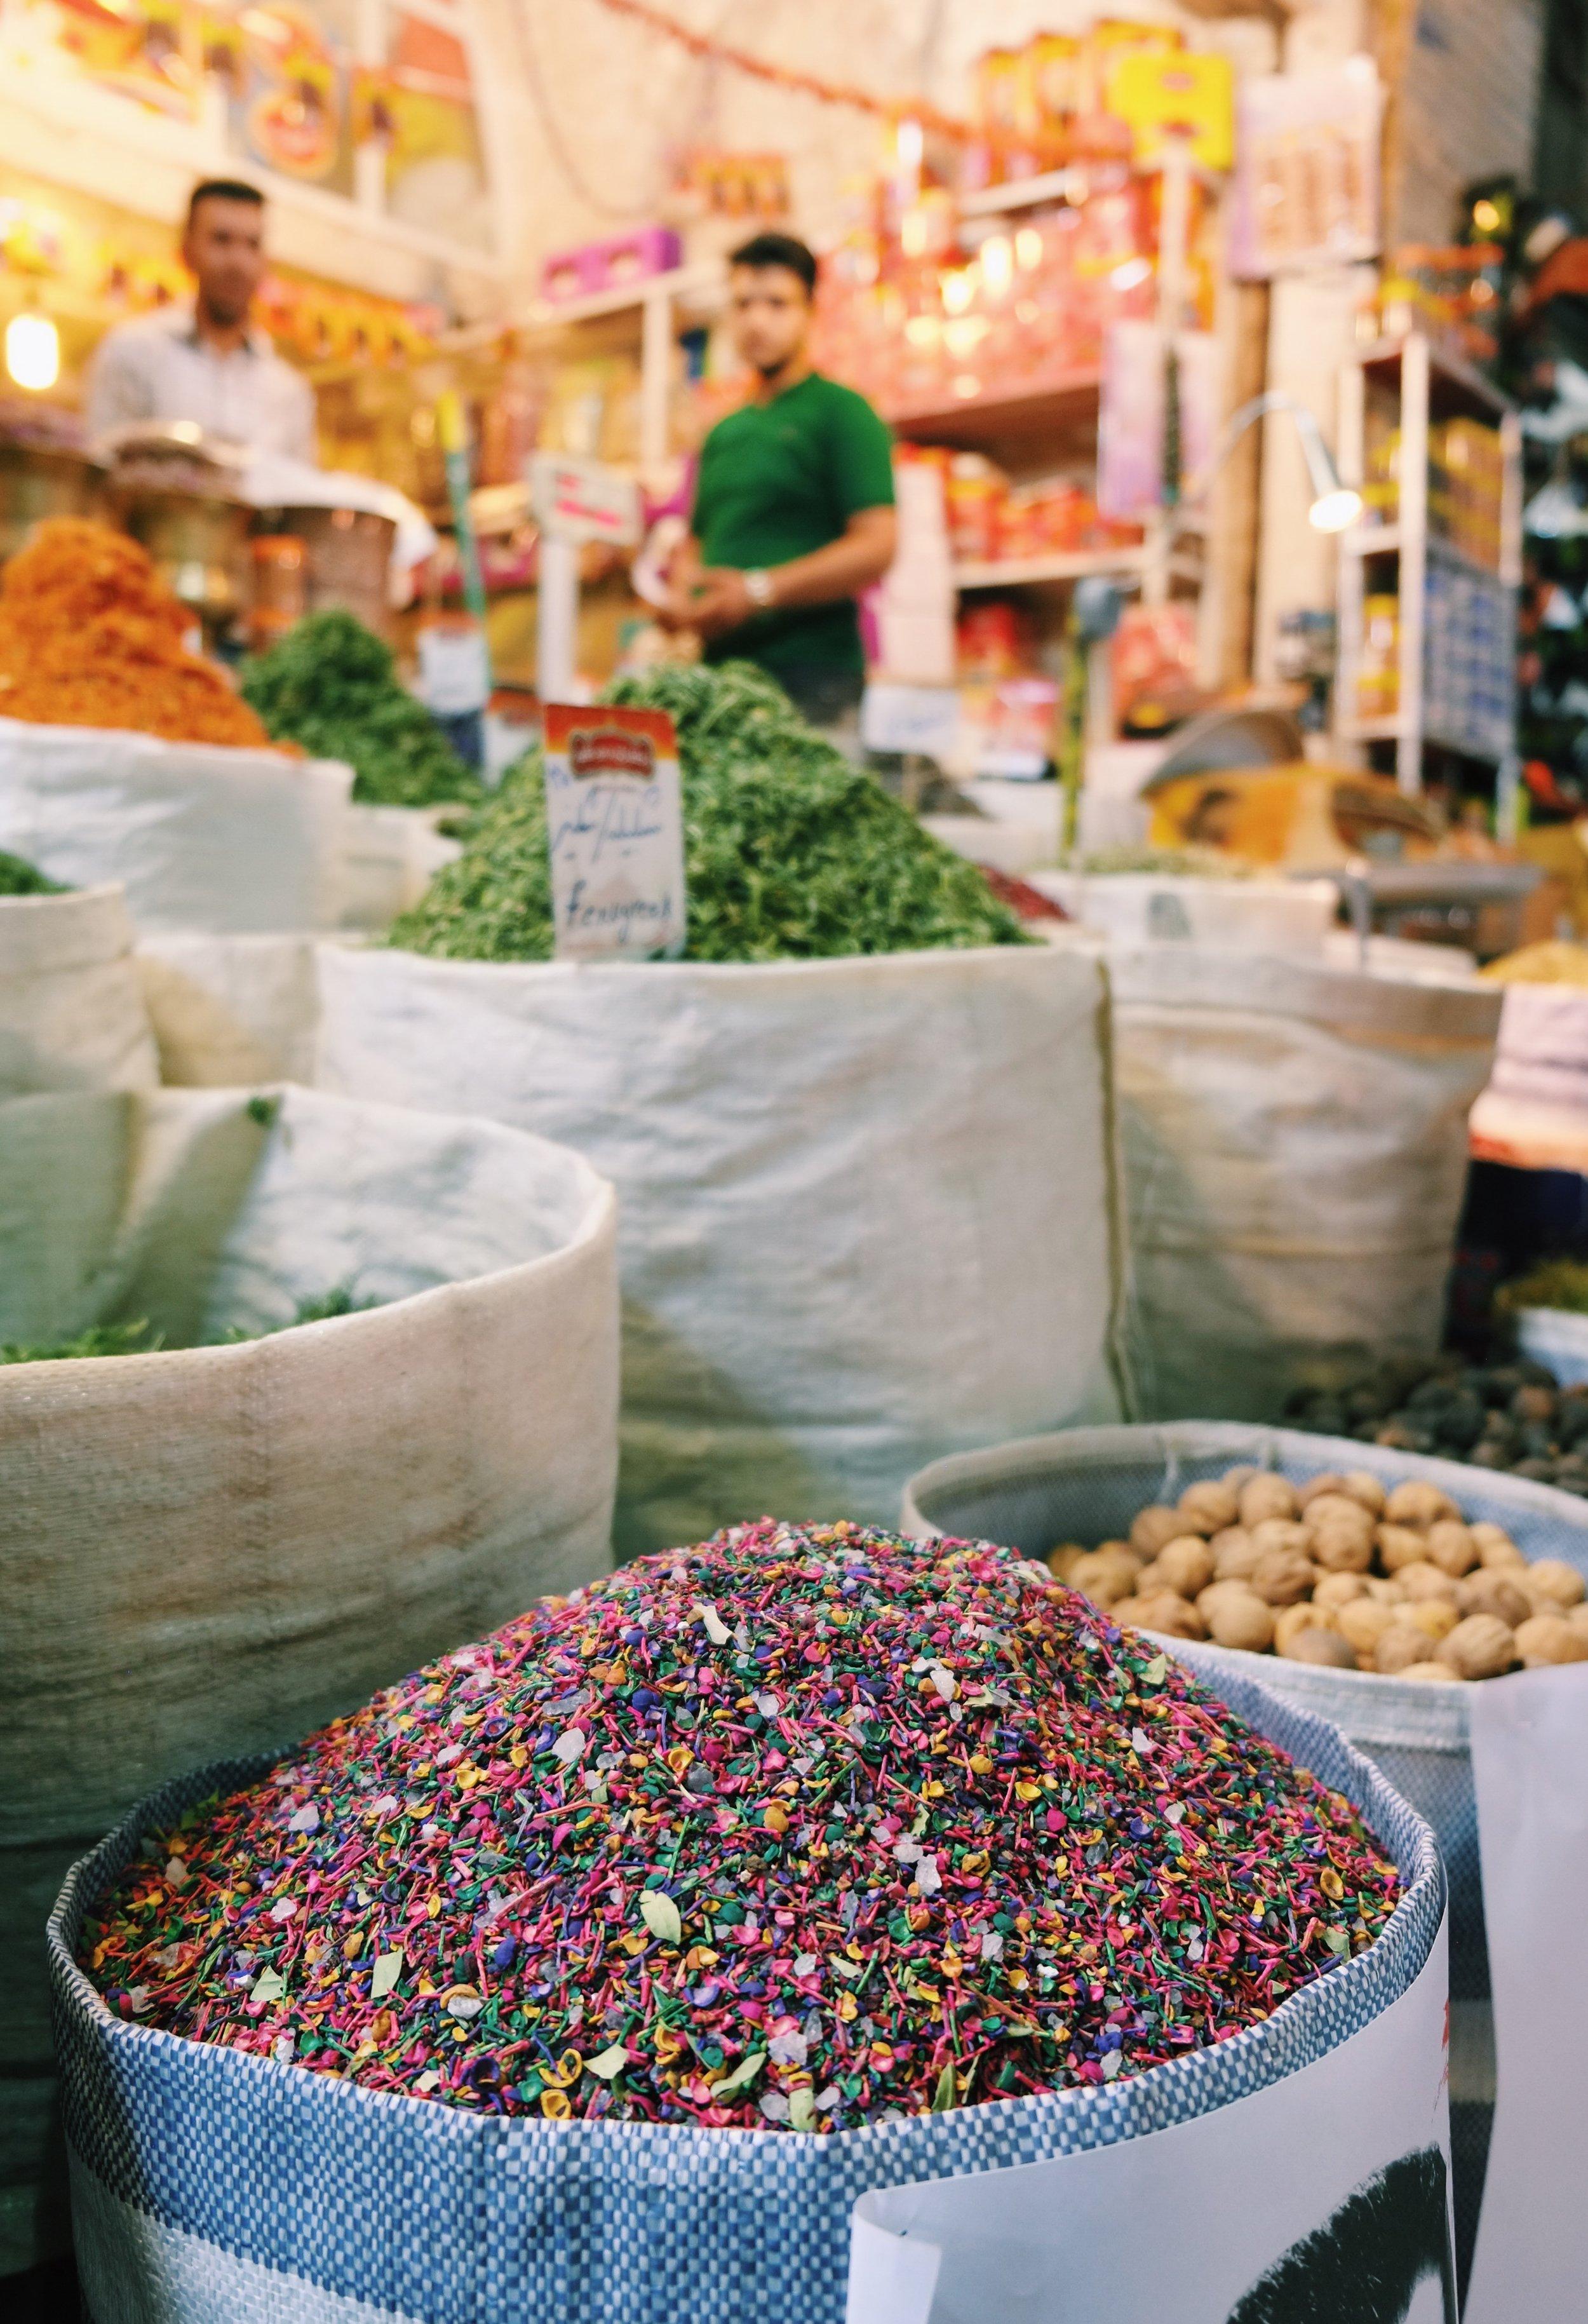 Esfahan market spices in Iran by Joost Bastmeijer.jpeg